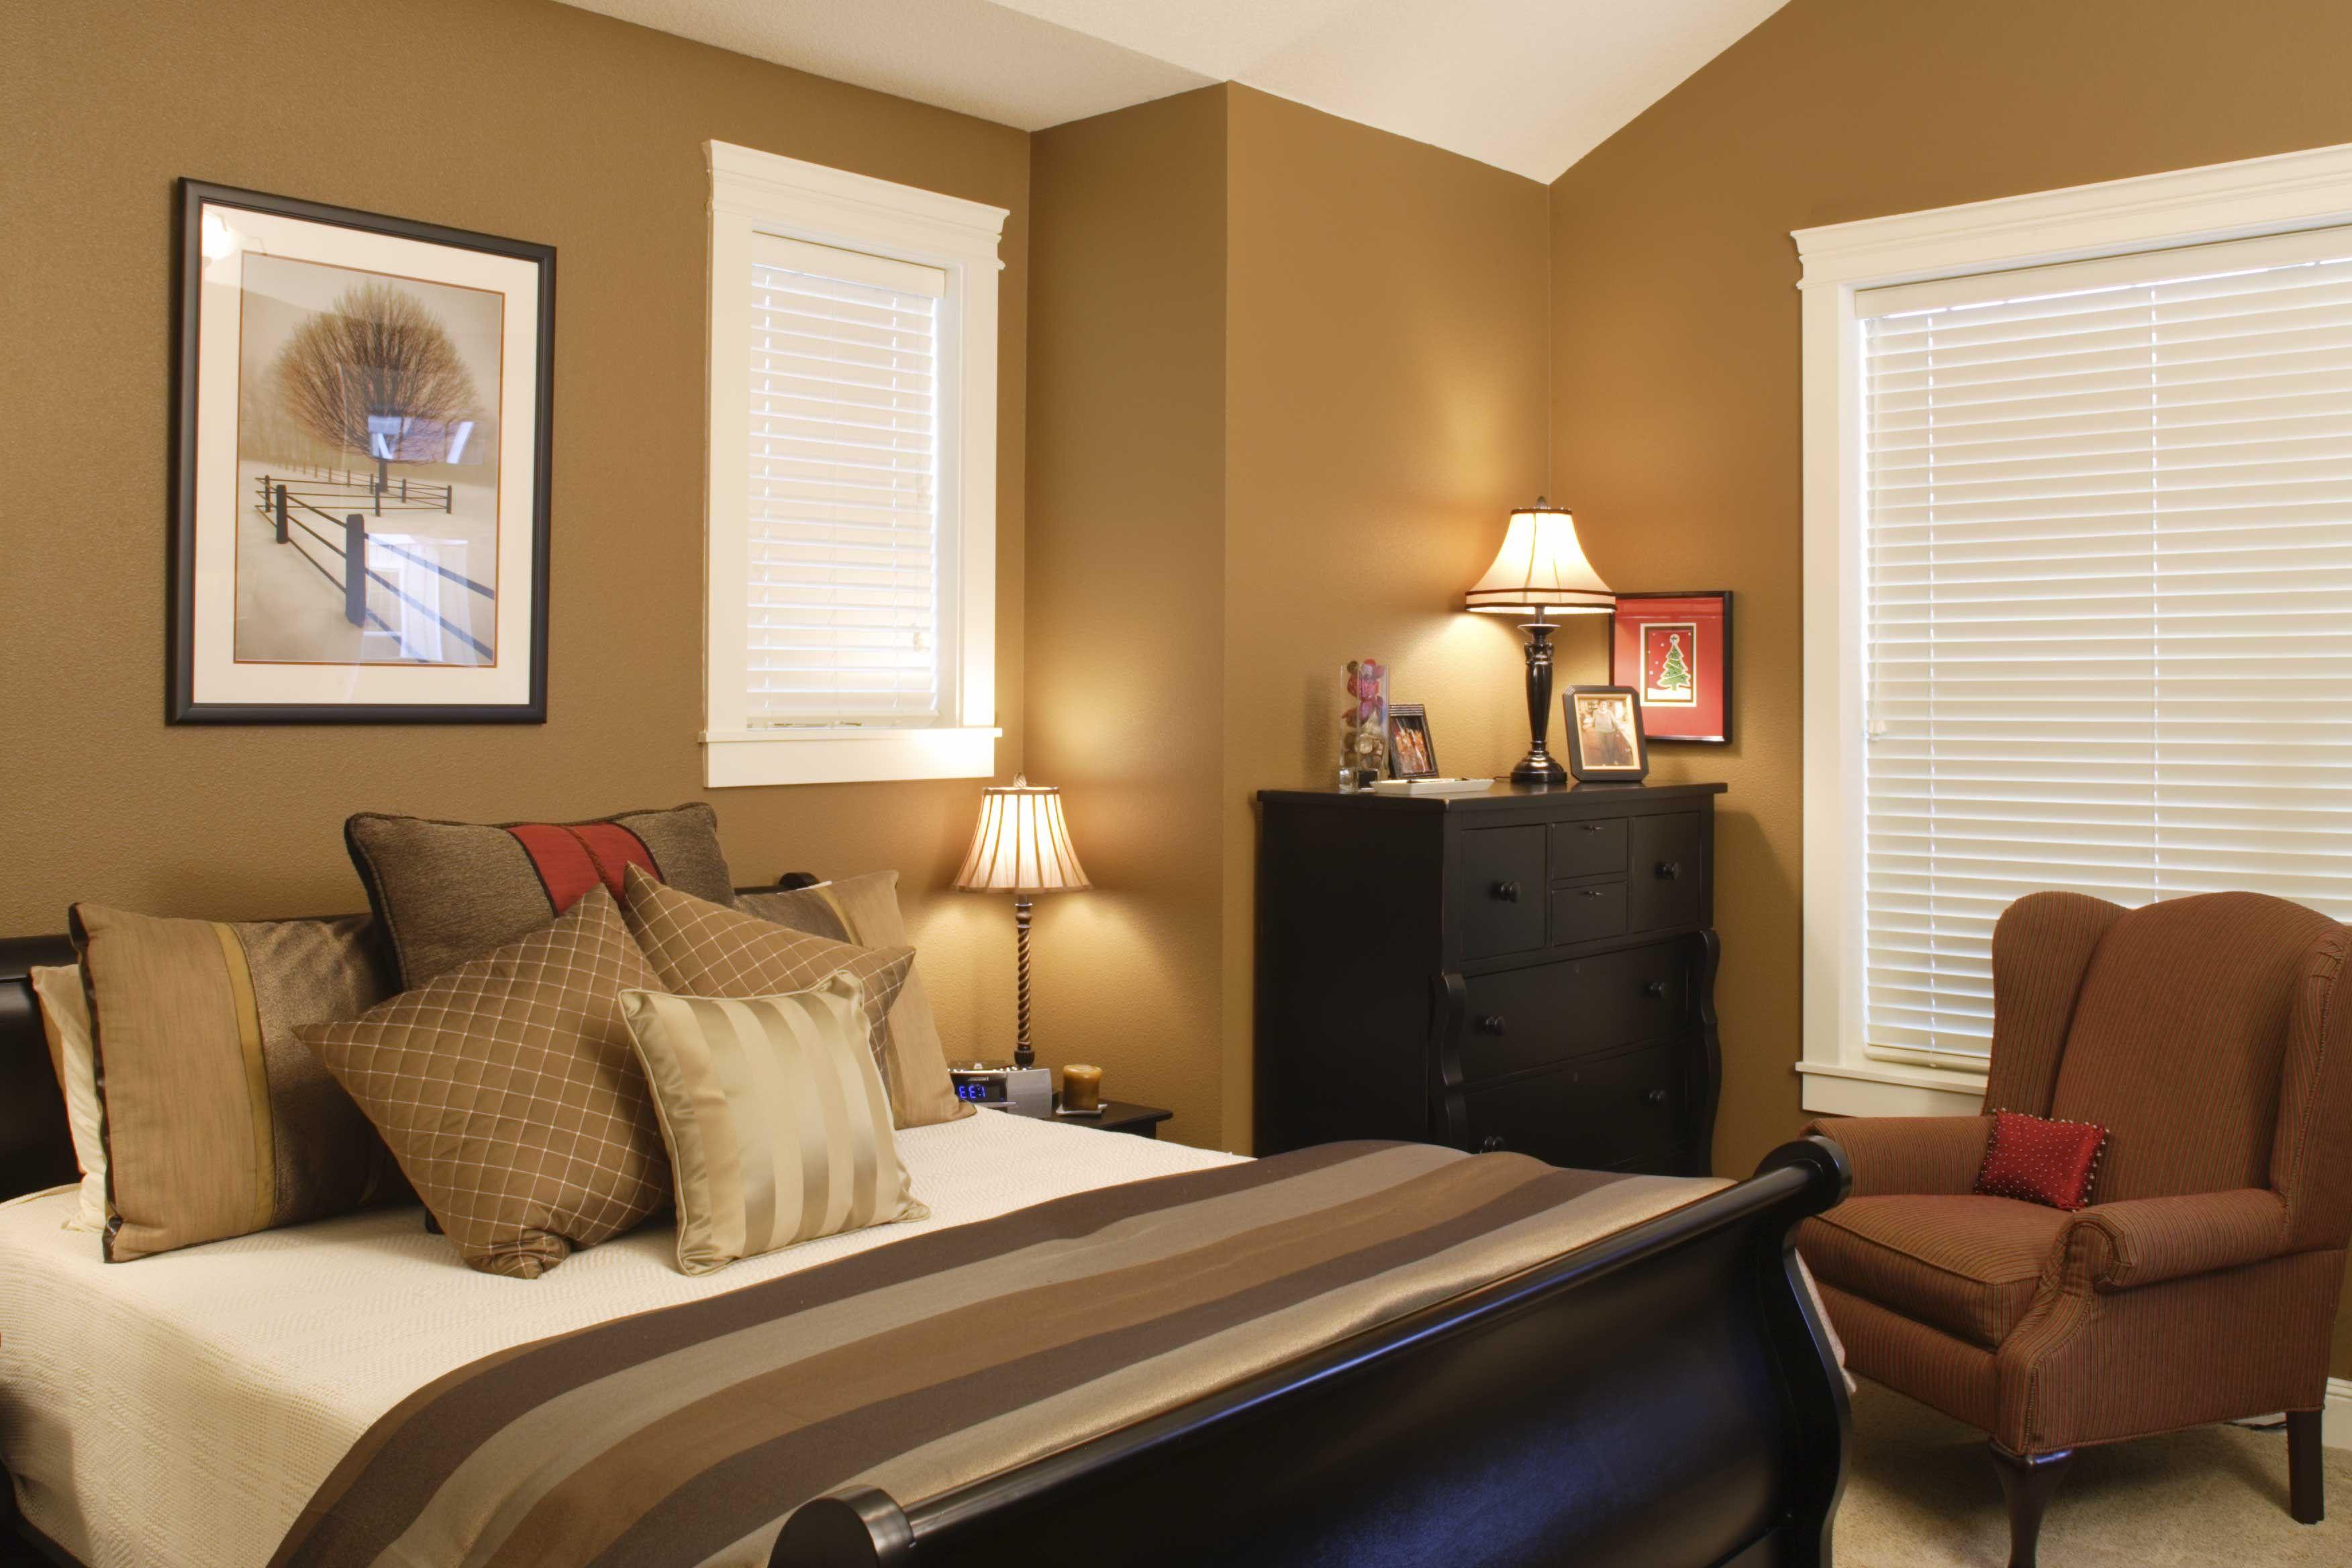 Natural Color Combinations Bedroom White Windows Dark Brown Sofa Elegant Black Cabinet Bed Simple